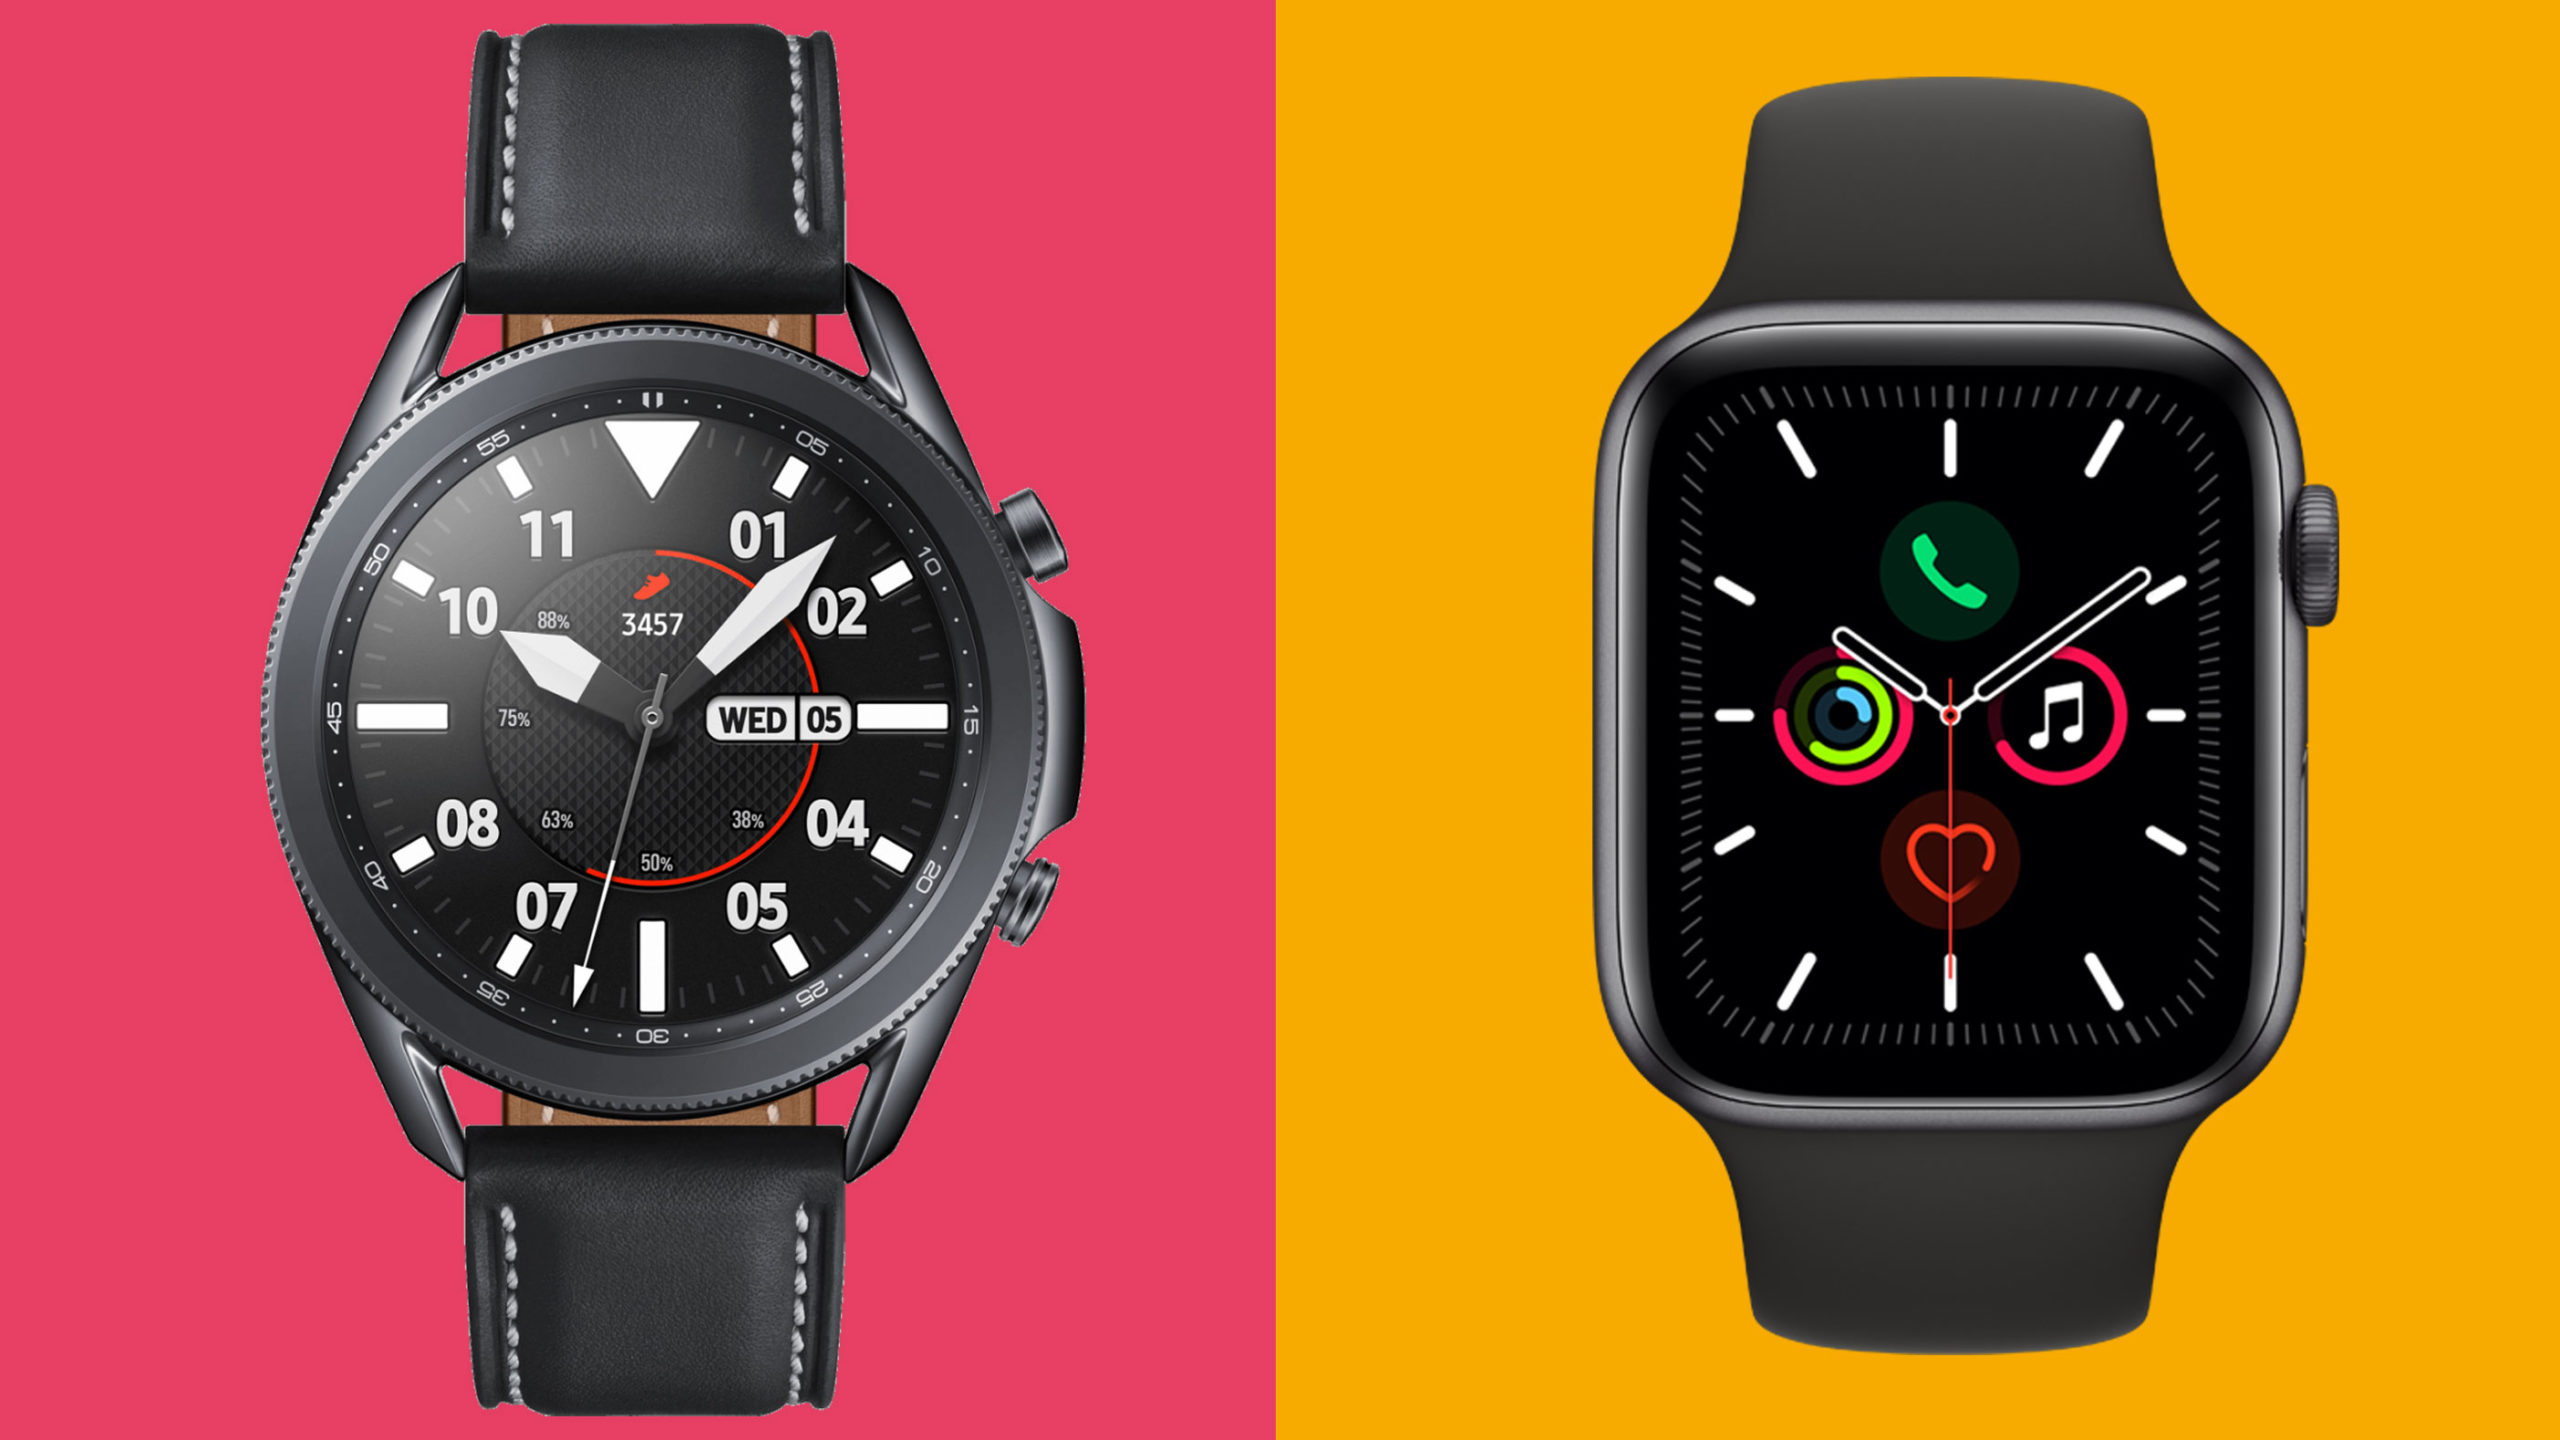 Samsung Galaxy Watch 3 vs Apple Watch 5